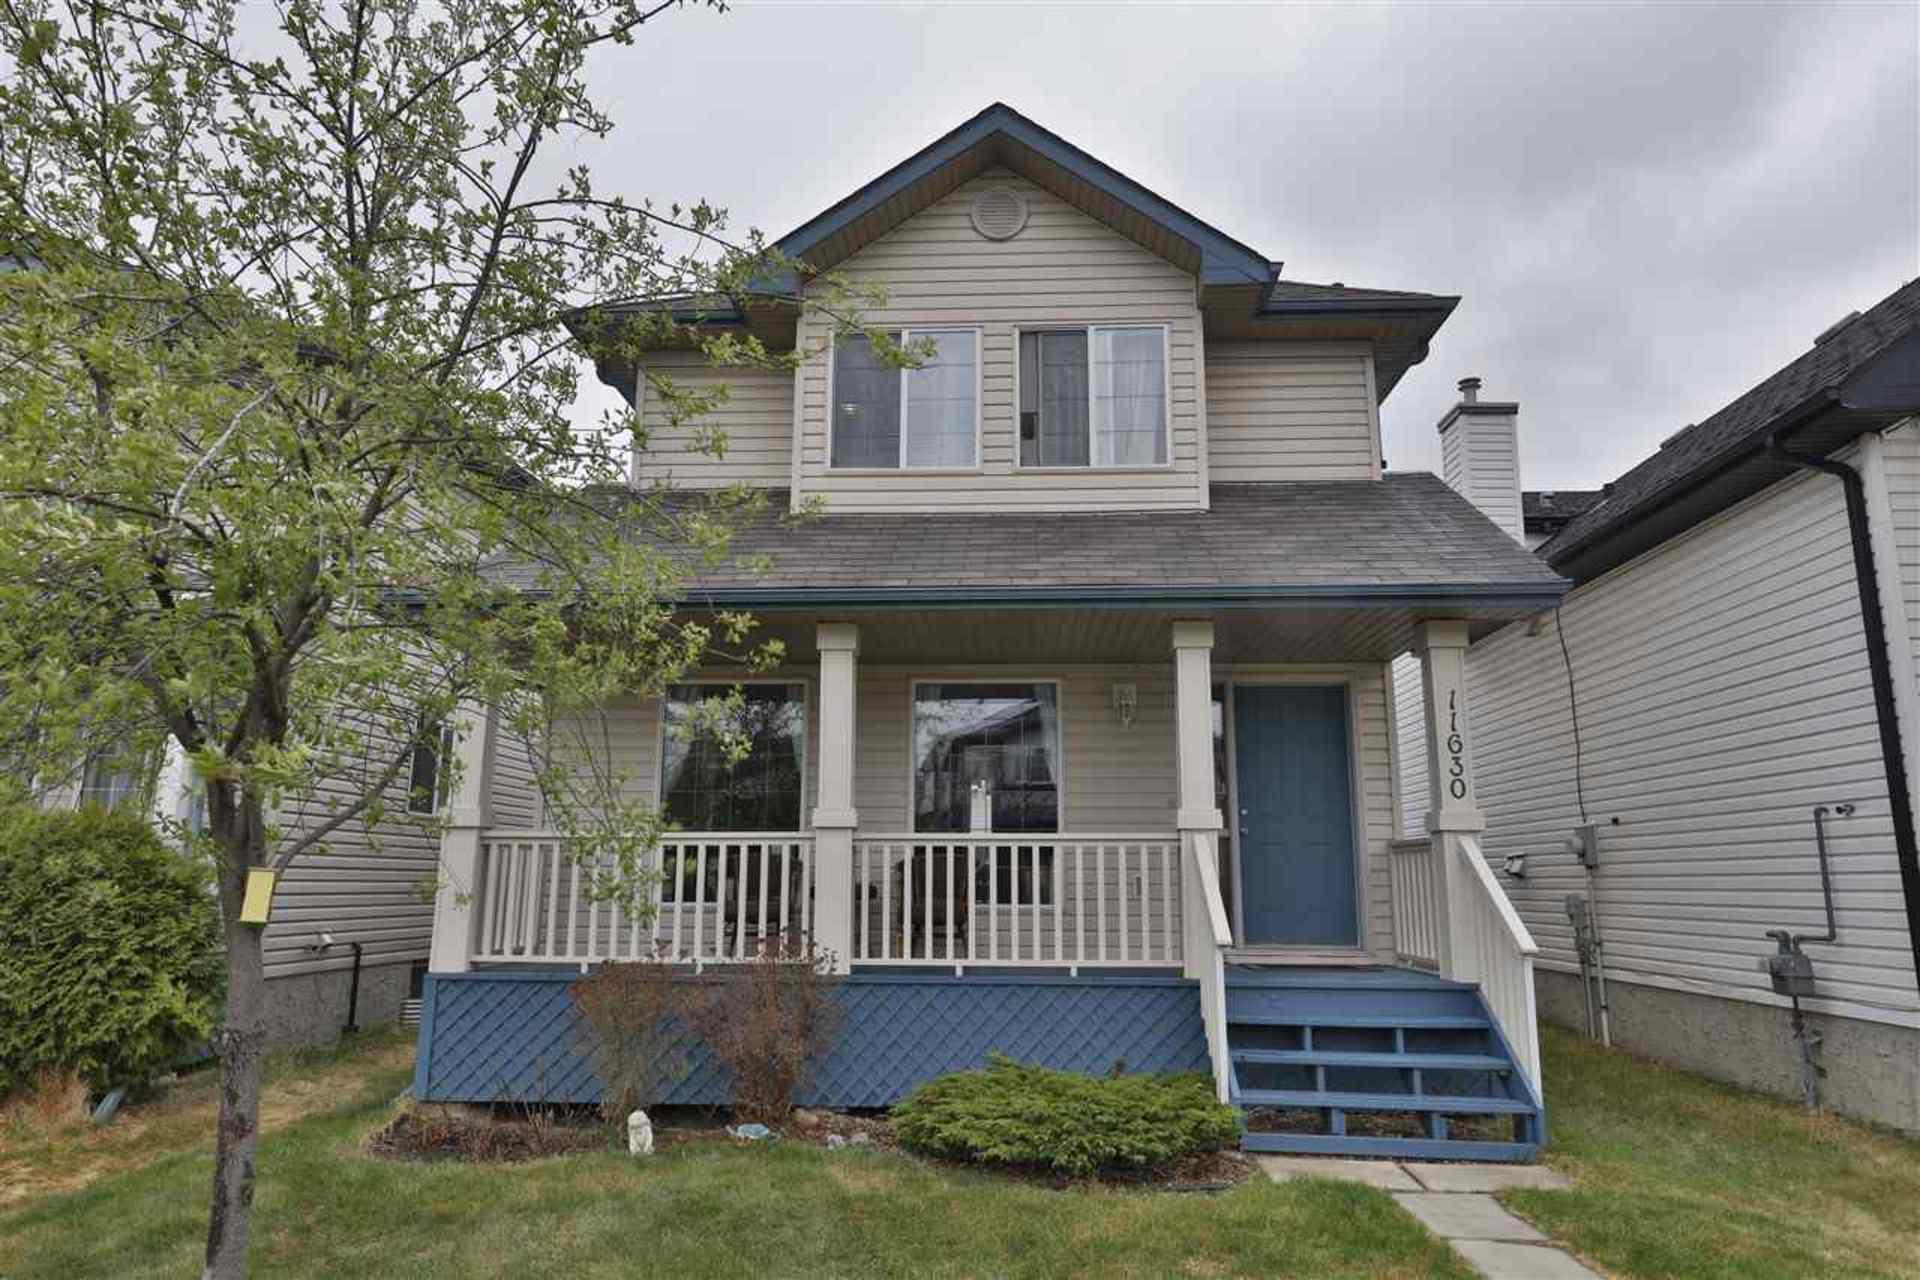 11630-167b-avenue-canossa-edmonton-01 at 11630 167b Avenue, Canossa, Edmonton